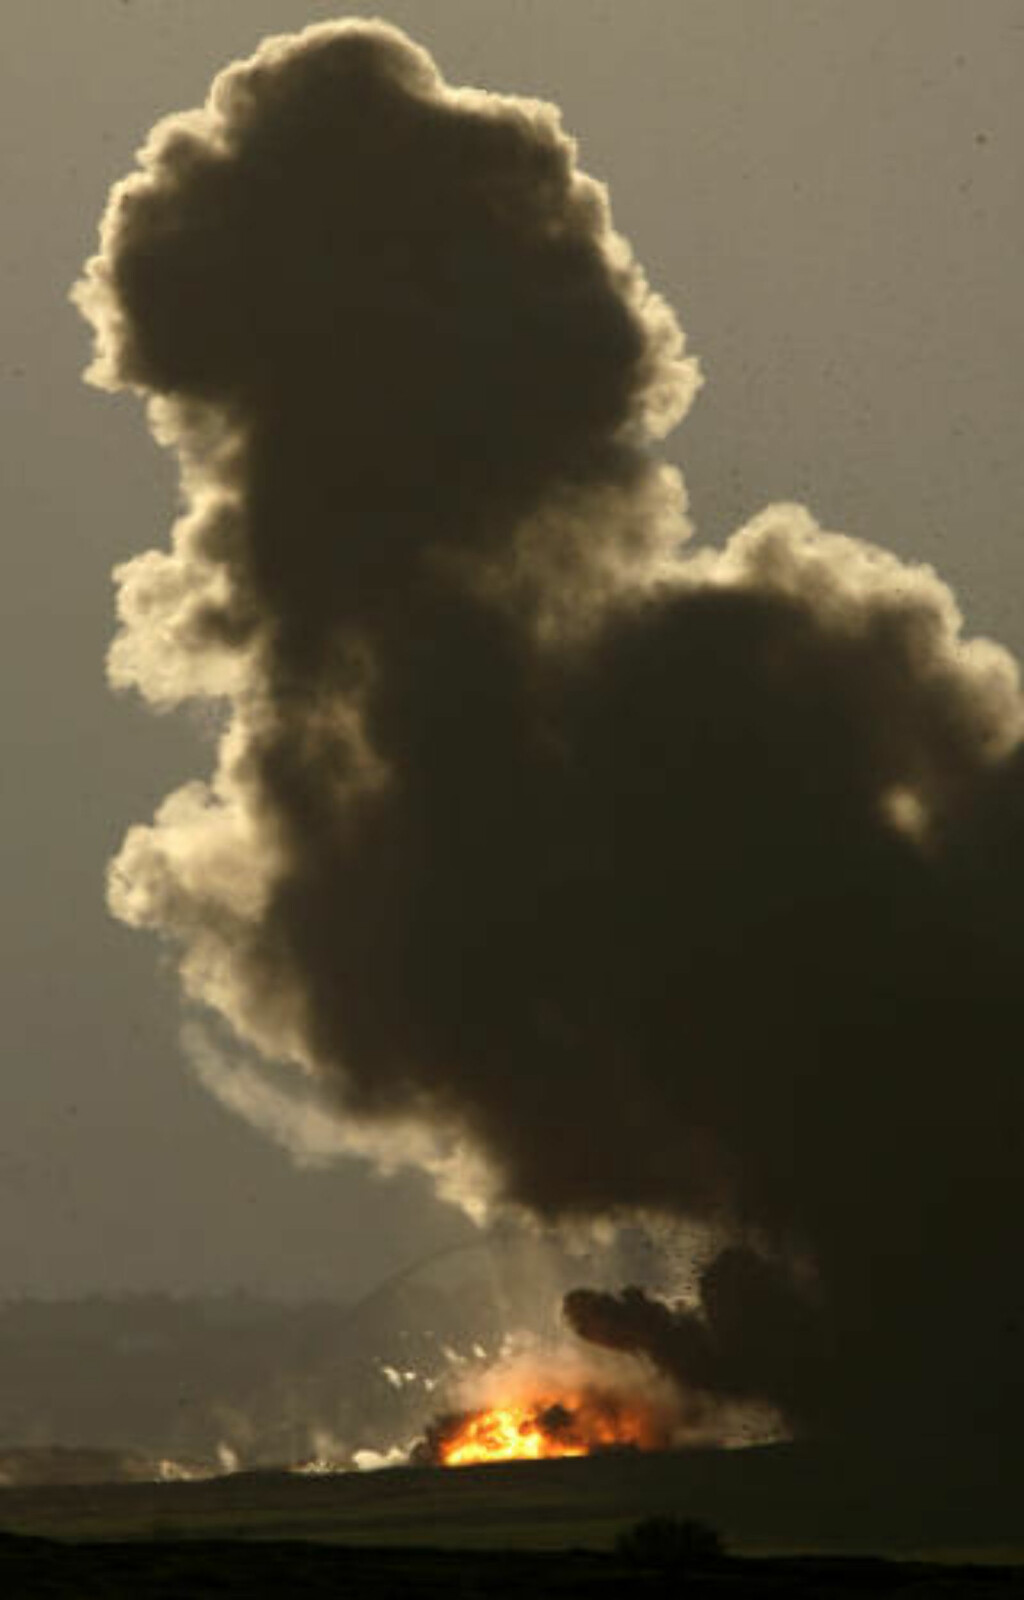 SVARER FOR FN: Richard Goldstone konkluderte i en uavhengig granskning at både israelerne og palestinerne har begått krigsforbrytelser under den 22 dager lange militæroffensiven i januar 2009. Goldstone påla både Israel og Hamas å granske anklagene om krigsforbrytelser, eller risikere at de havner på bordet til Den internasjonale straffedomstolen (ICC). Svarene ble denne uka oversendt til FNs generalsekretær Ban Ki-moon, som videresendte dem til FNs hovedforsamling. Foto: REUTERS/Nikola Solic/Scanpix